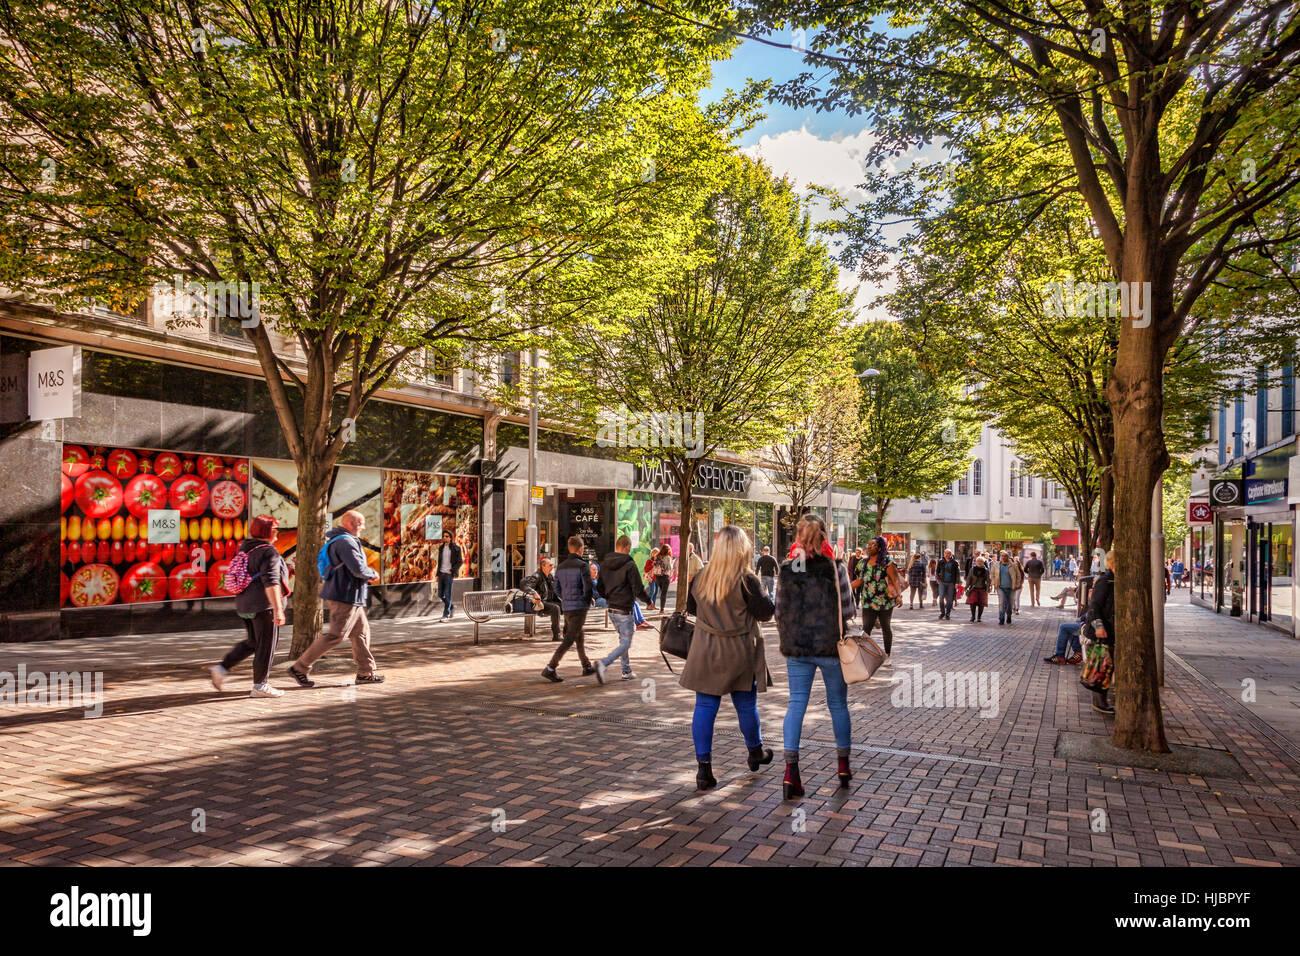 People shopping in Albert Street, Nottingham, England, UK - Stock Image